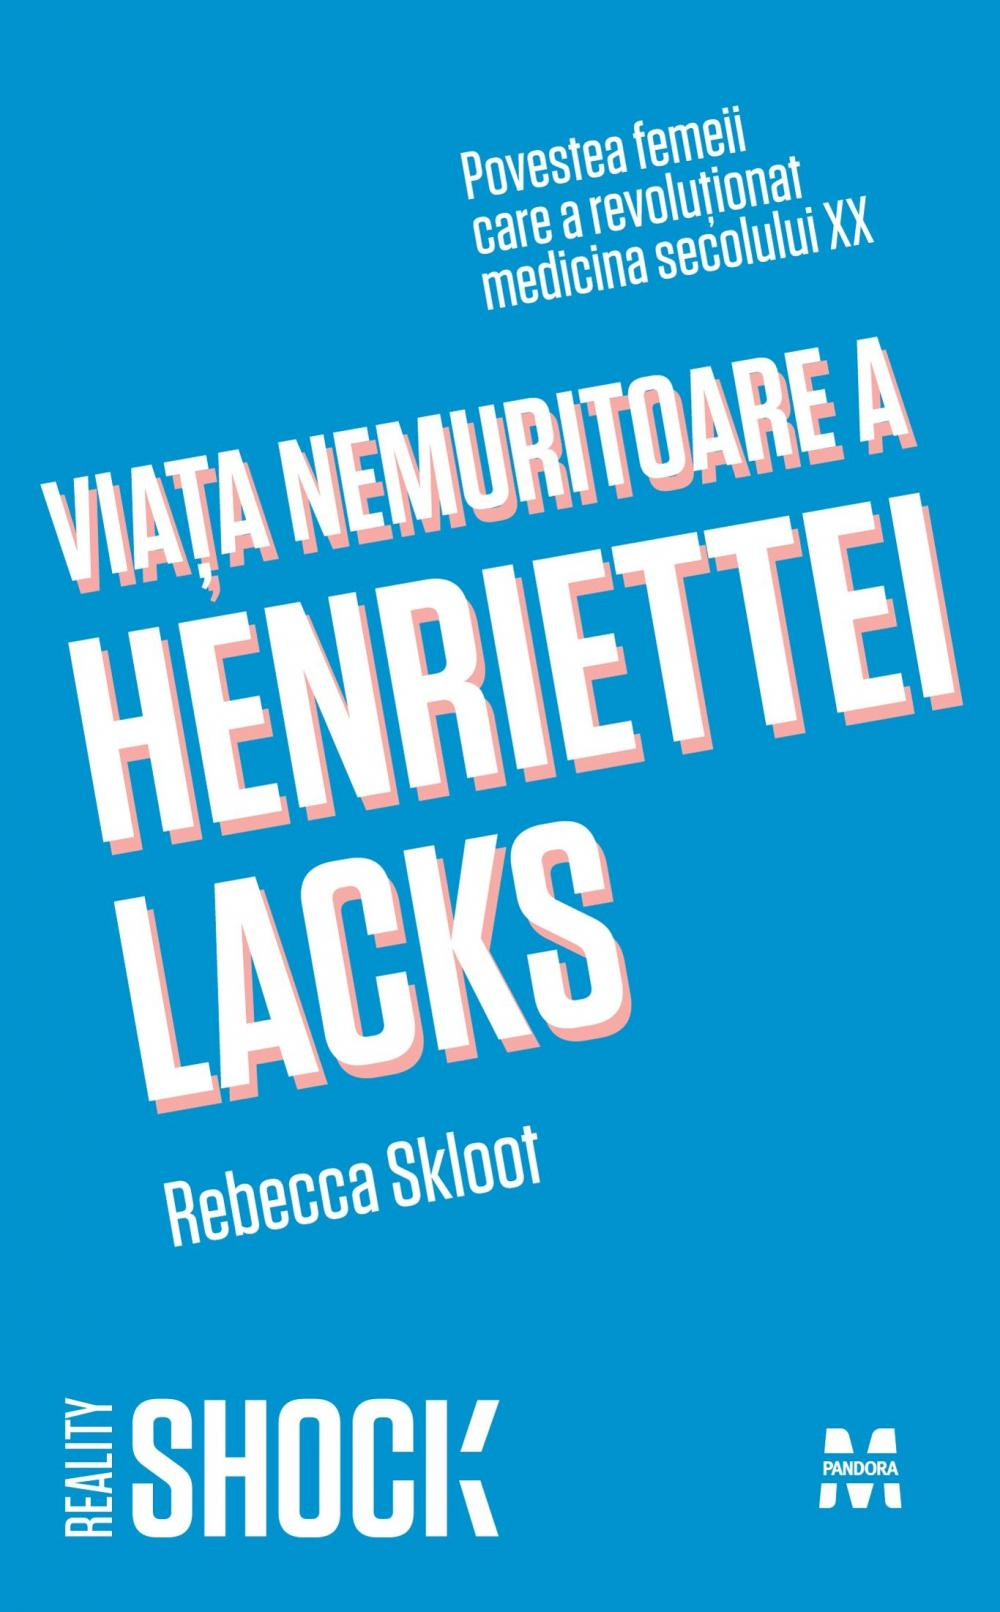 VIATA NEMURTOARE A HENRIETTEI LACKS